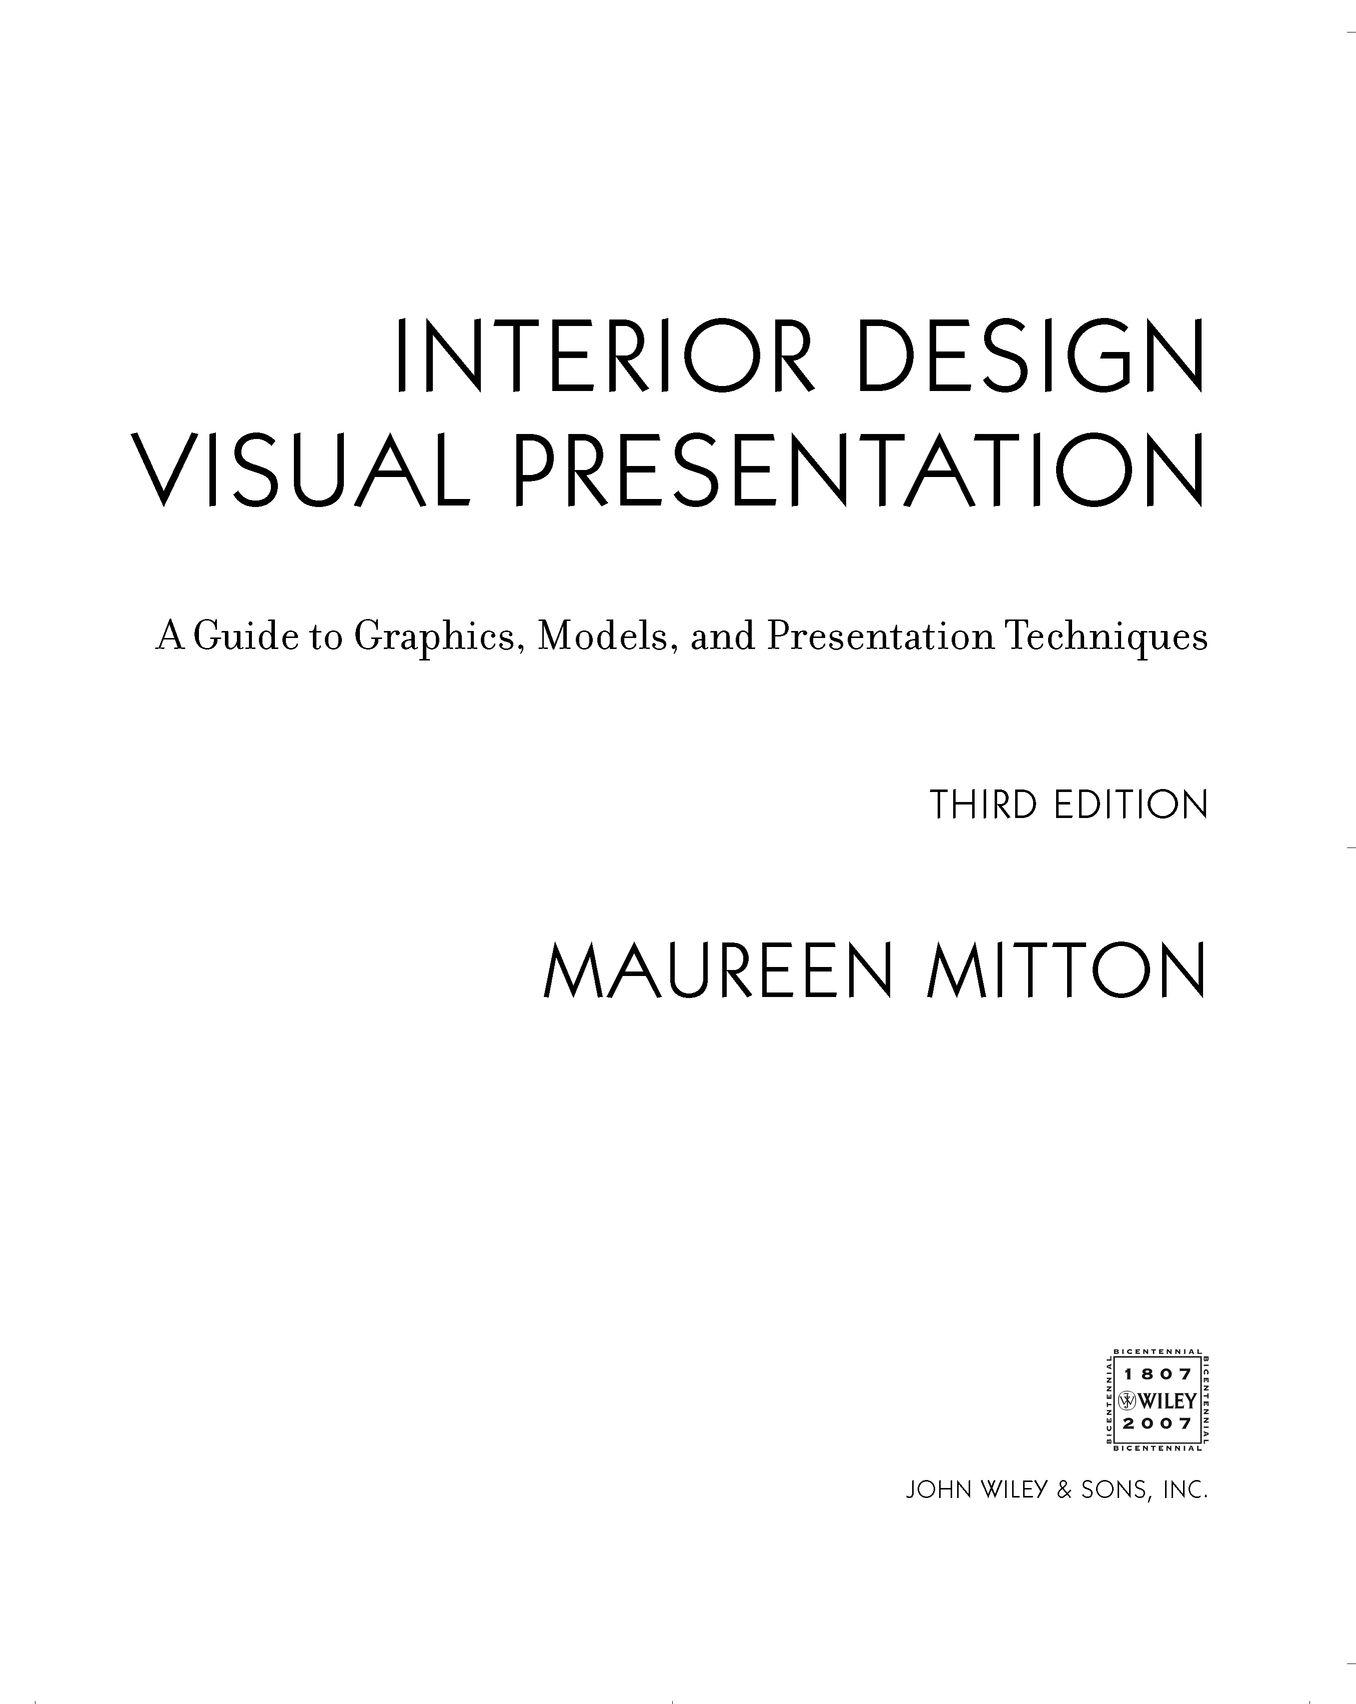 Interior Design Visual Presentation Maureen Mitton 京东阅读 在线阅读